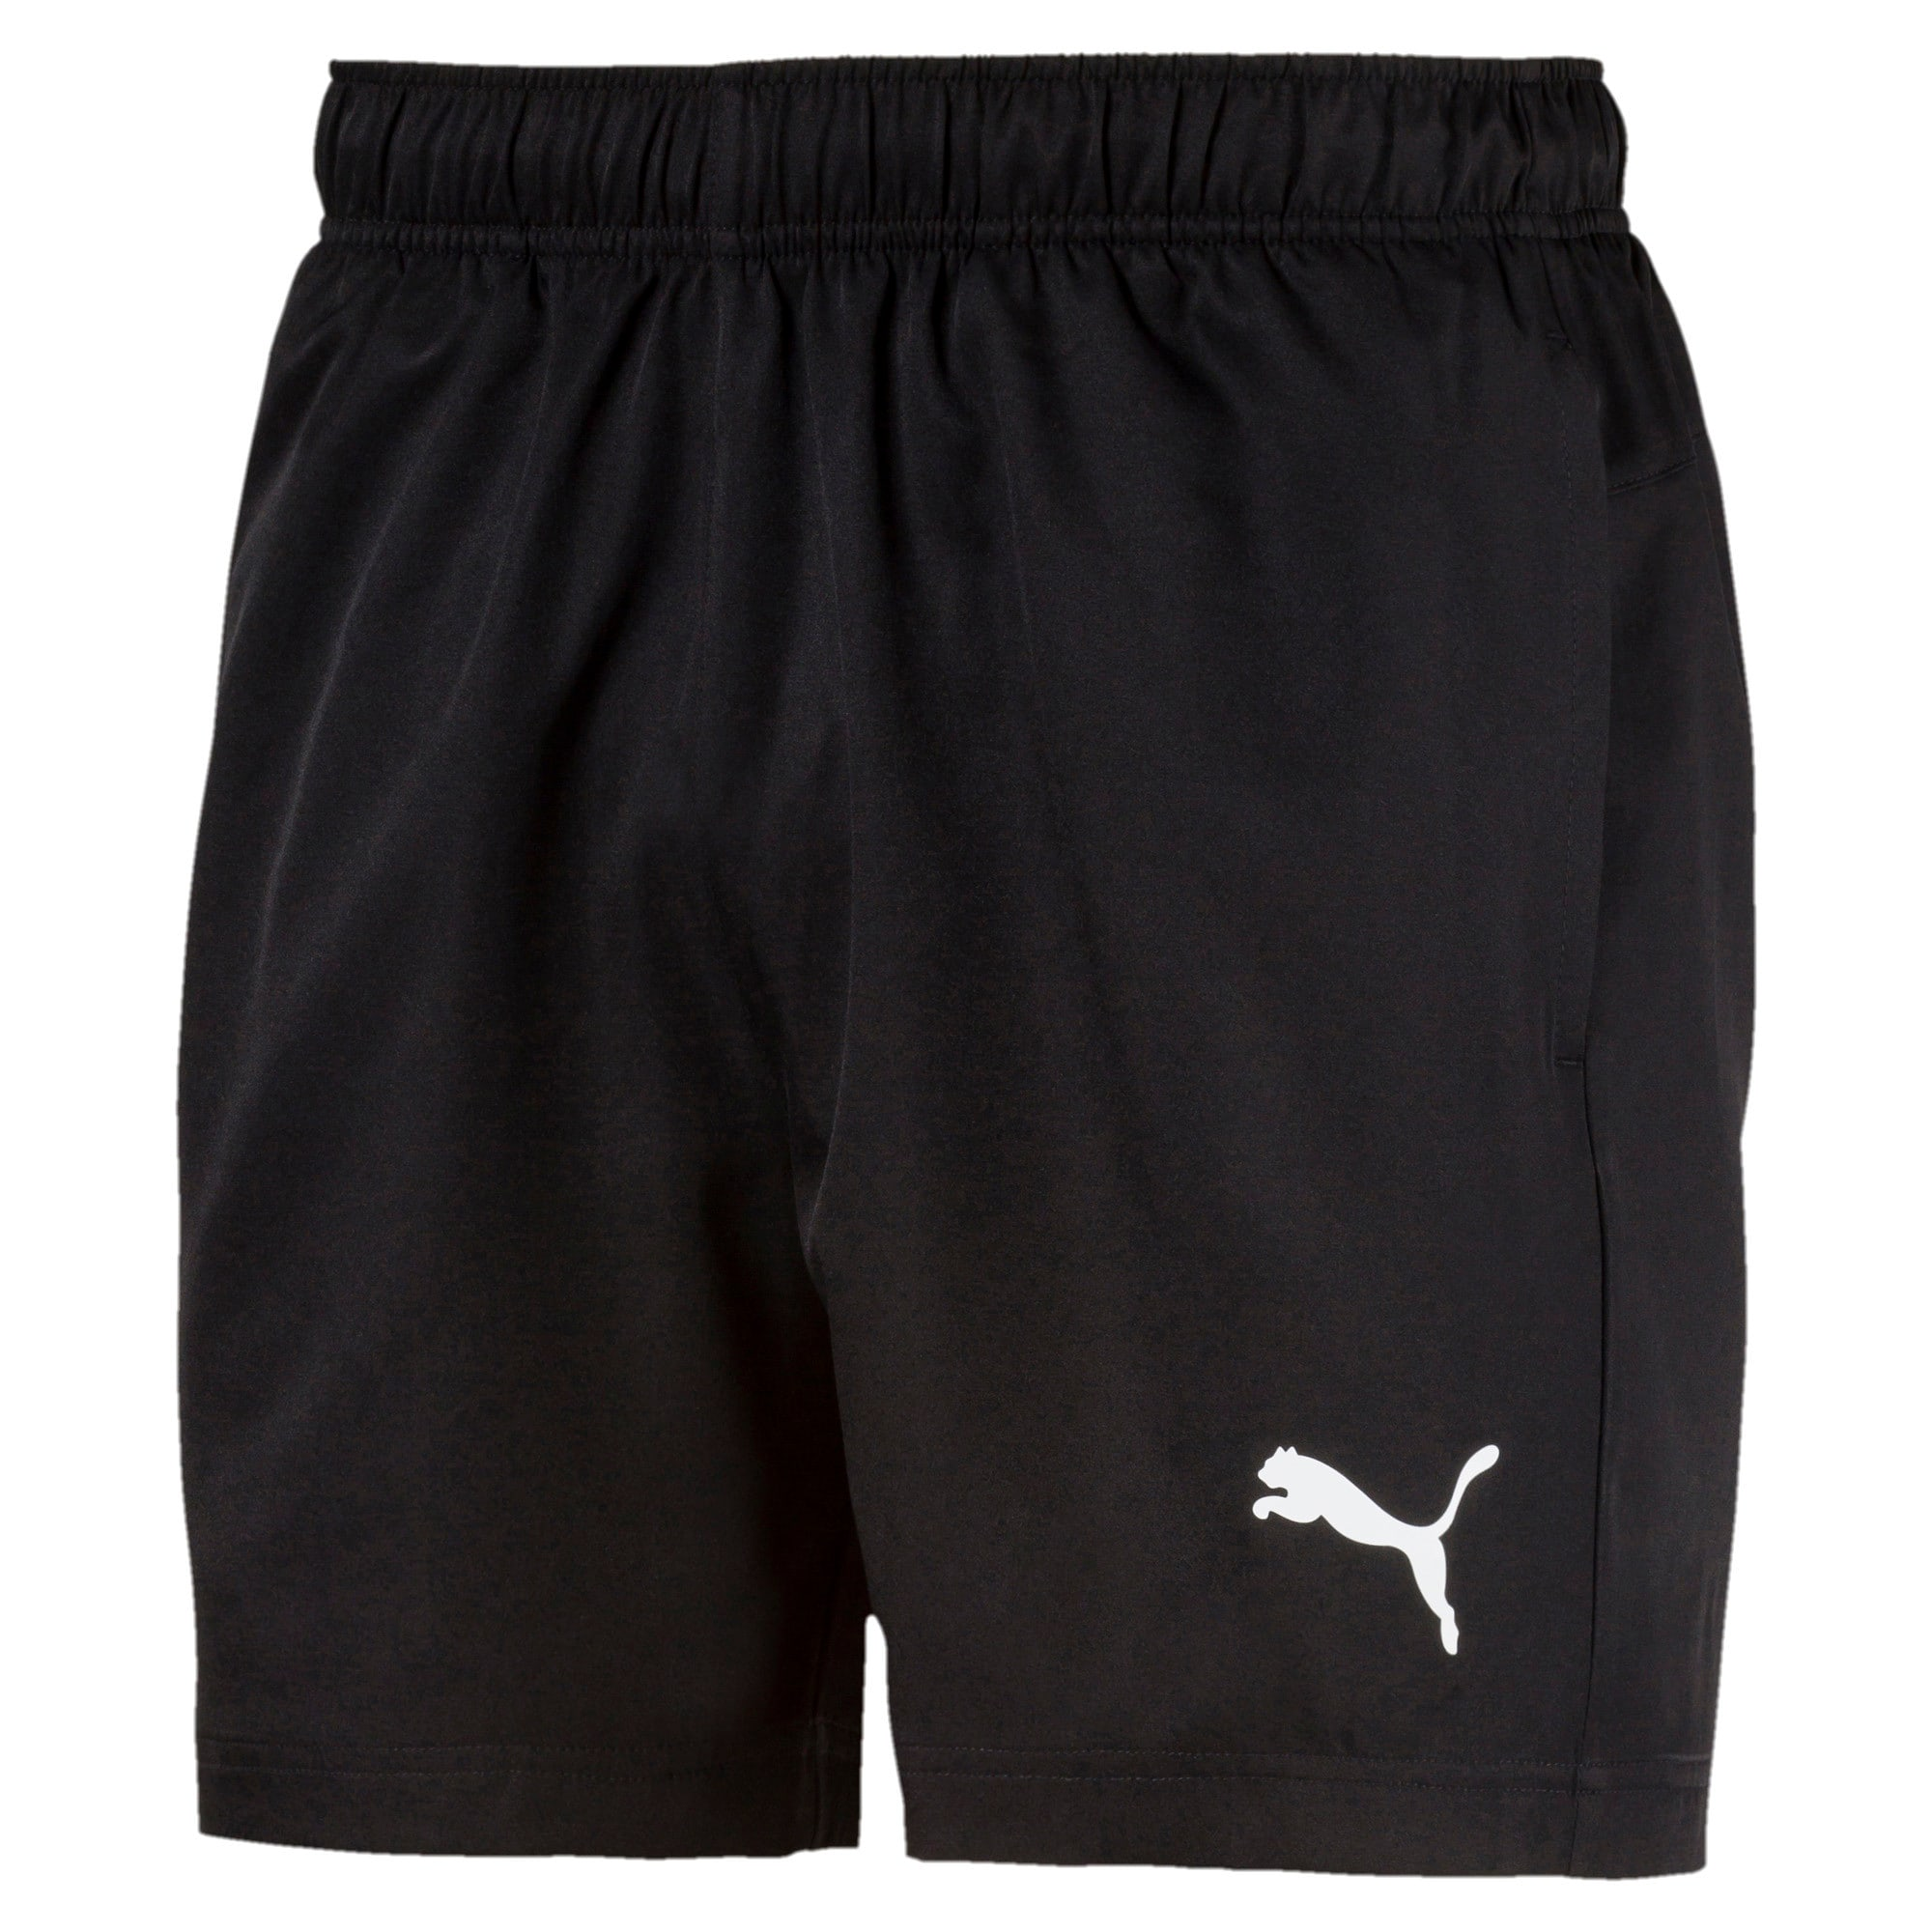 "Thumbnail 4 of Active Woven 5"" Men's Training Shorts, Puma Black, medium"